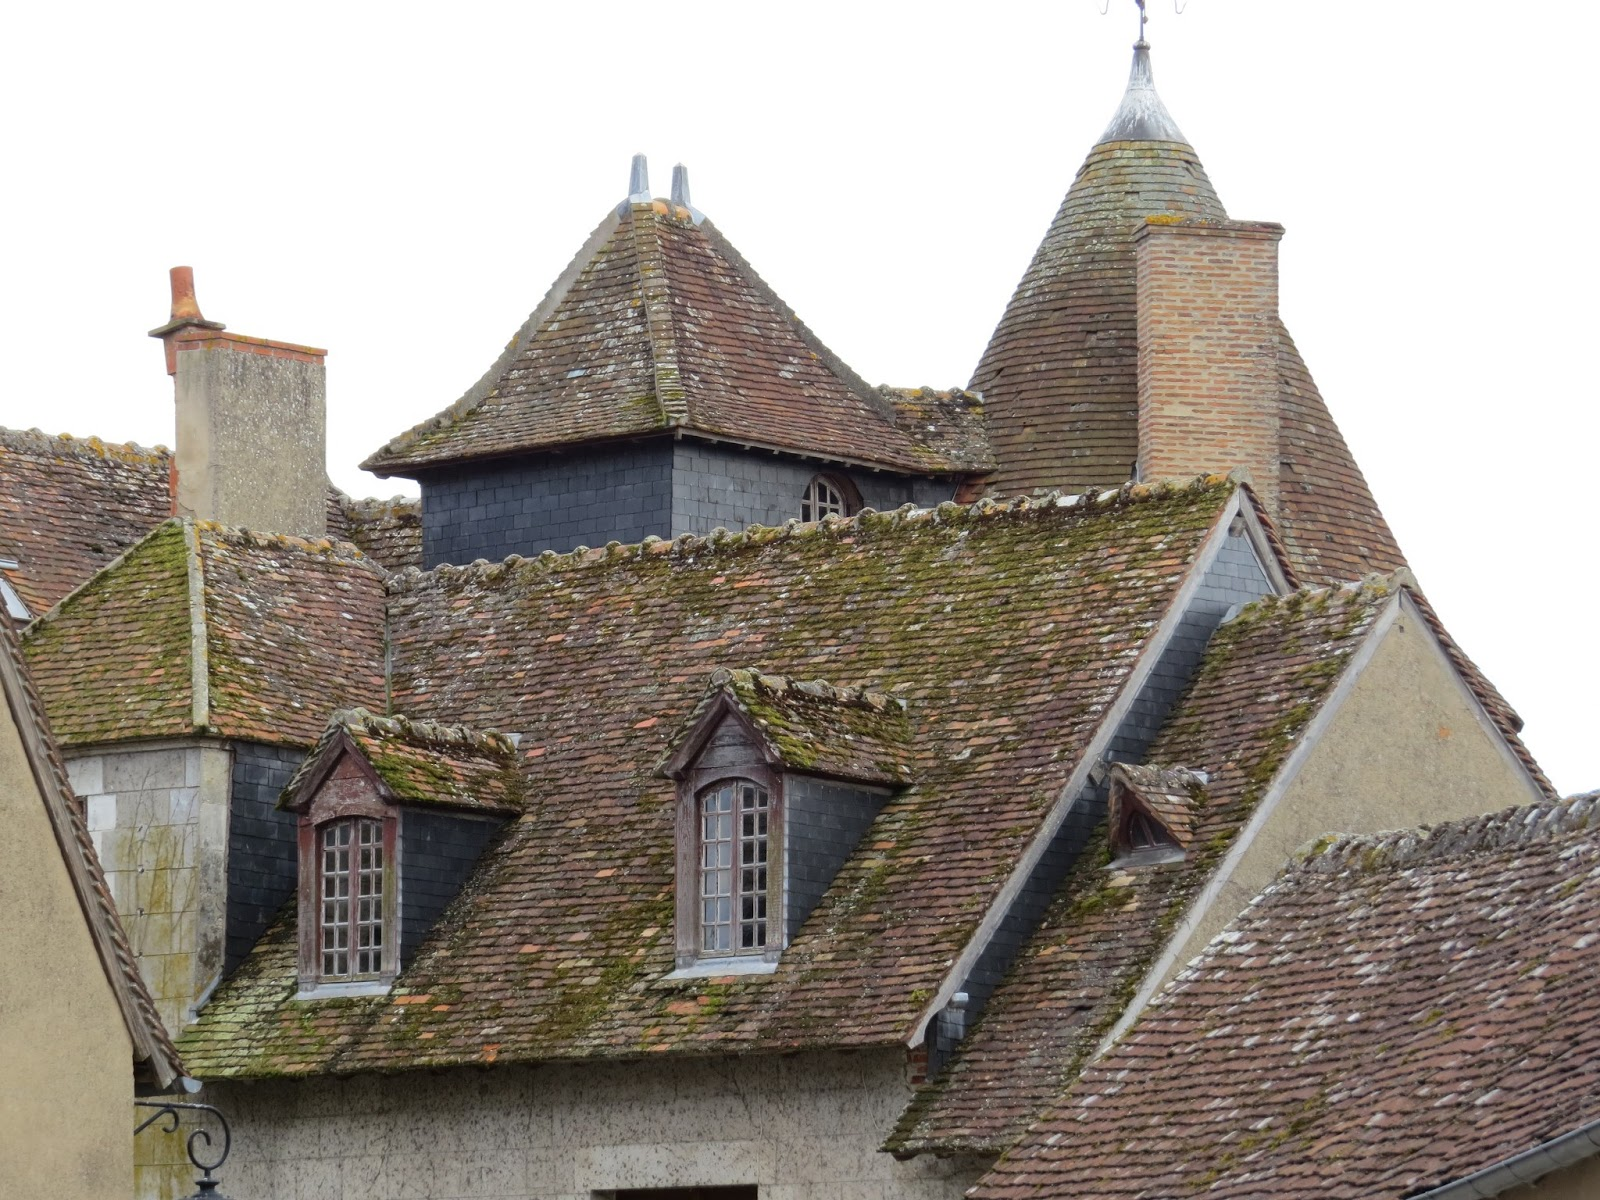 good morning sologne cite medievale de mennetou sur cher episode 1 sur 14. Black Bedroom Furniture Sets. Home Design Ideas